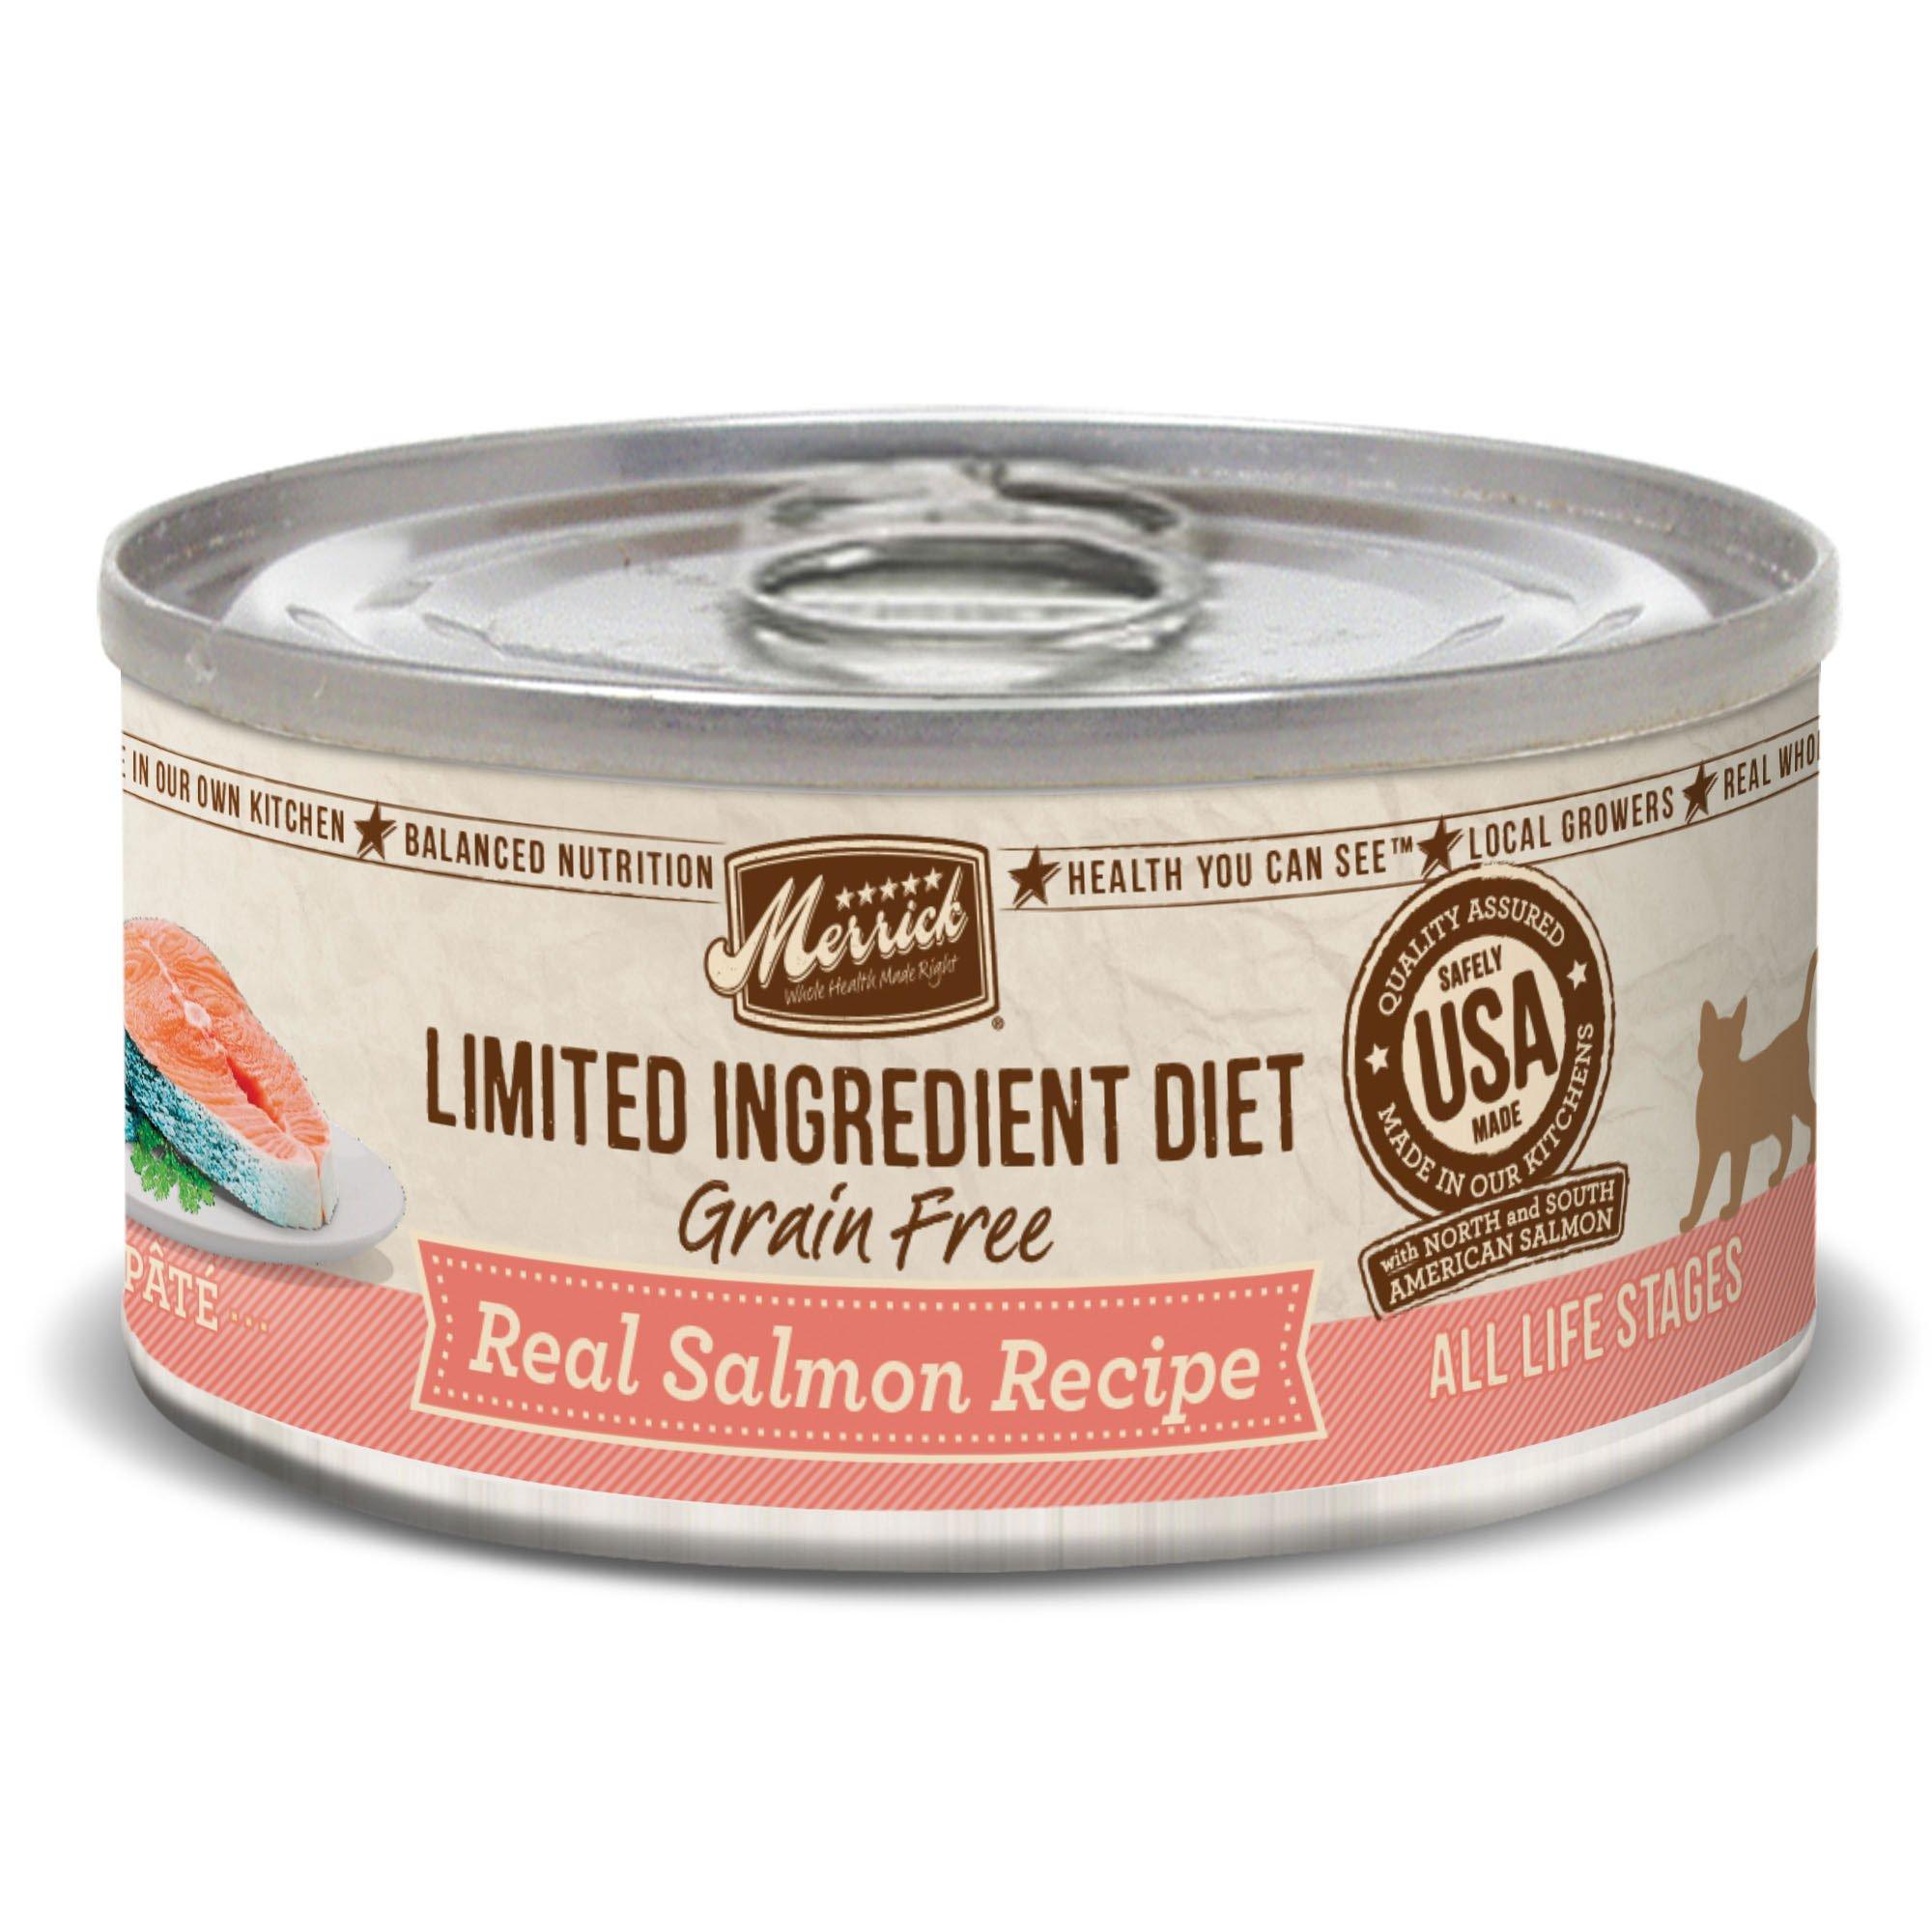 Merrick Limited Ingredient Diet Grain Free Salmon Canned Cat Food